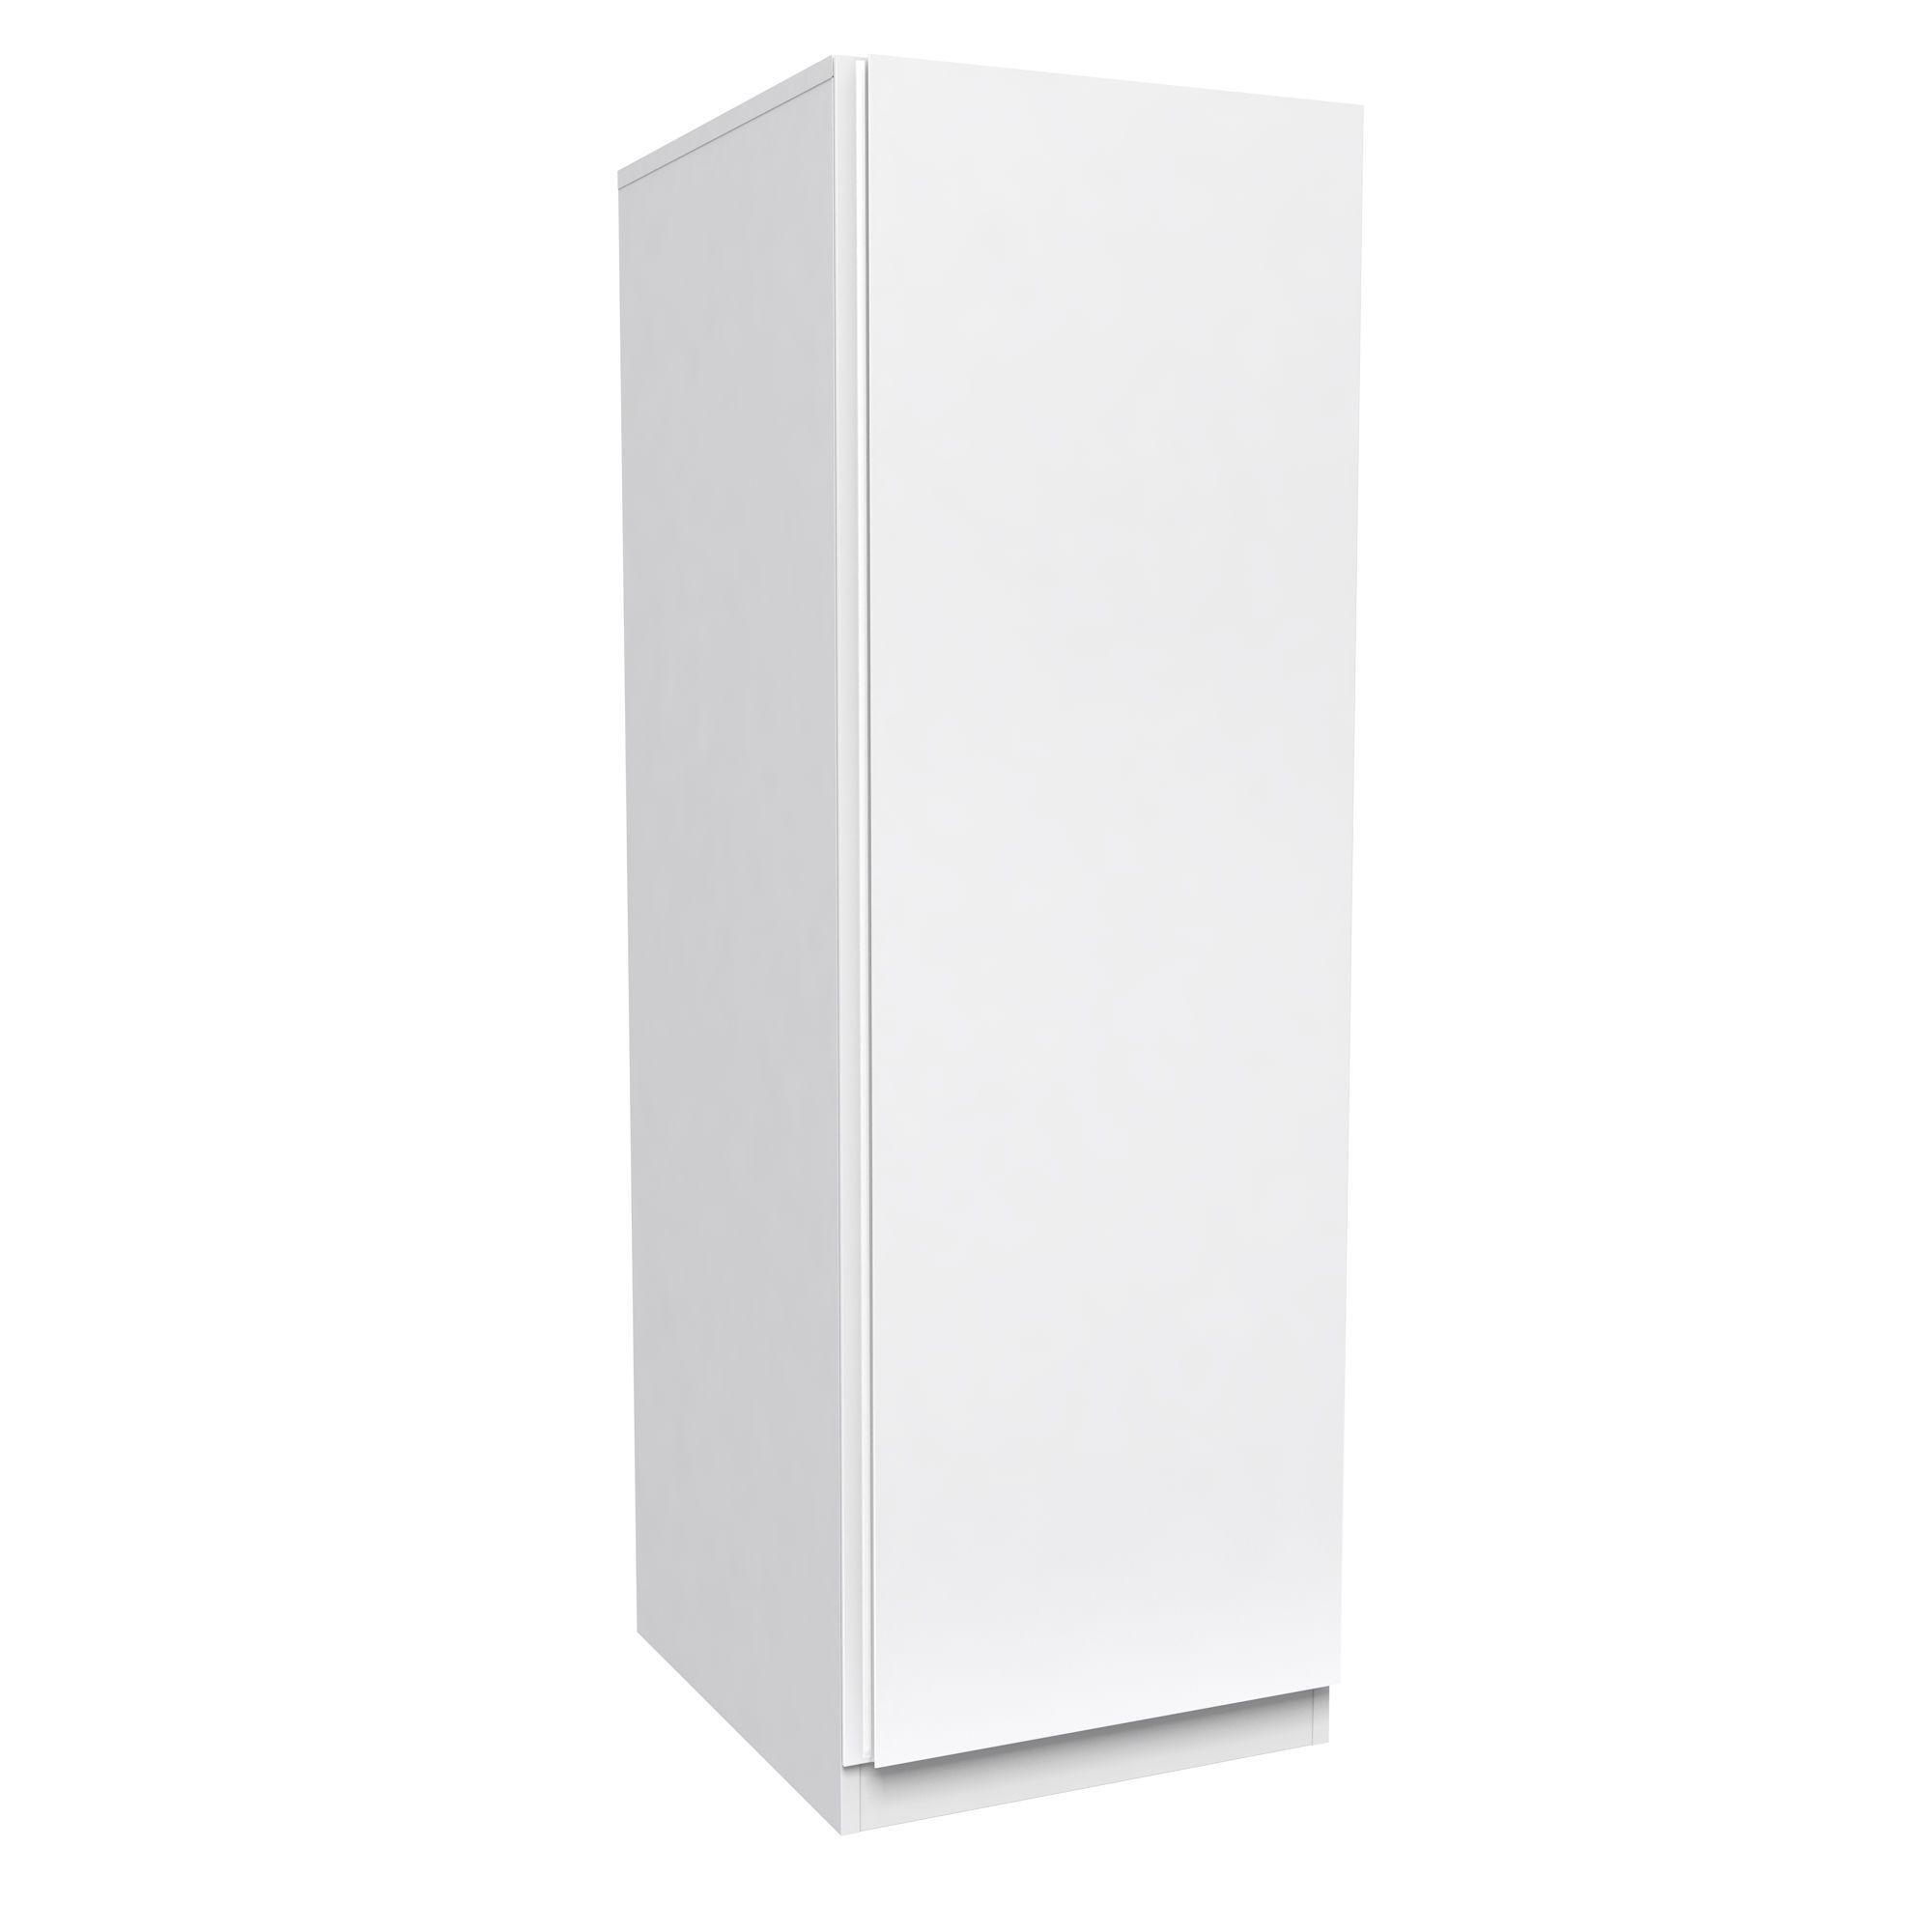 Darwin Handpicked White Matt 1 Door Single Wardrobe (h)2004mm (w)498mm